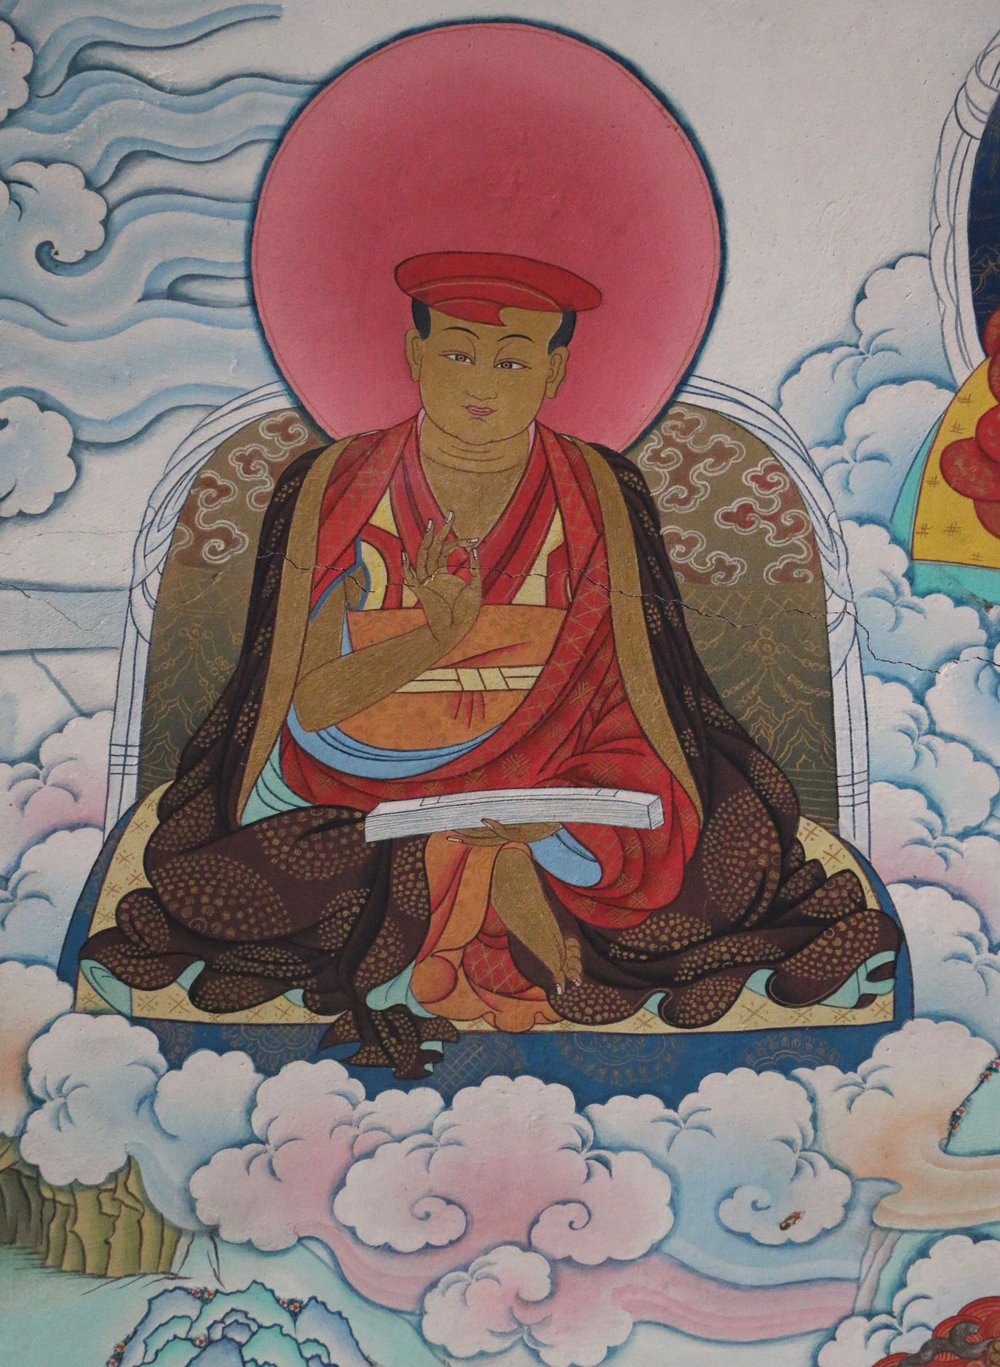 Sakya Gongma Sakya Kunga Gyaltsen